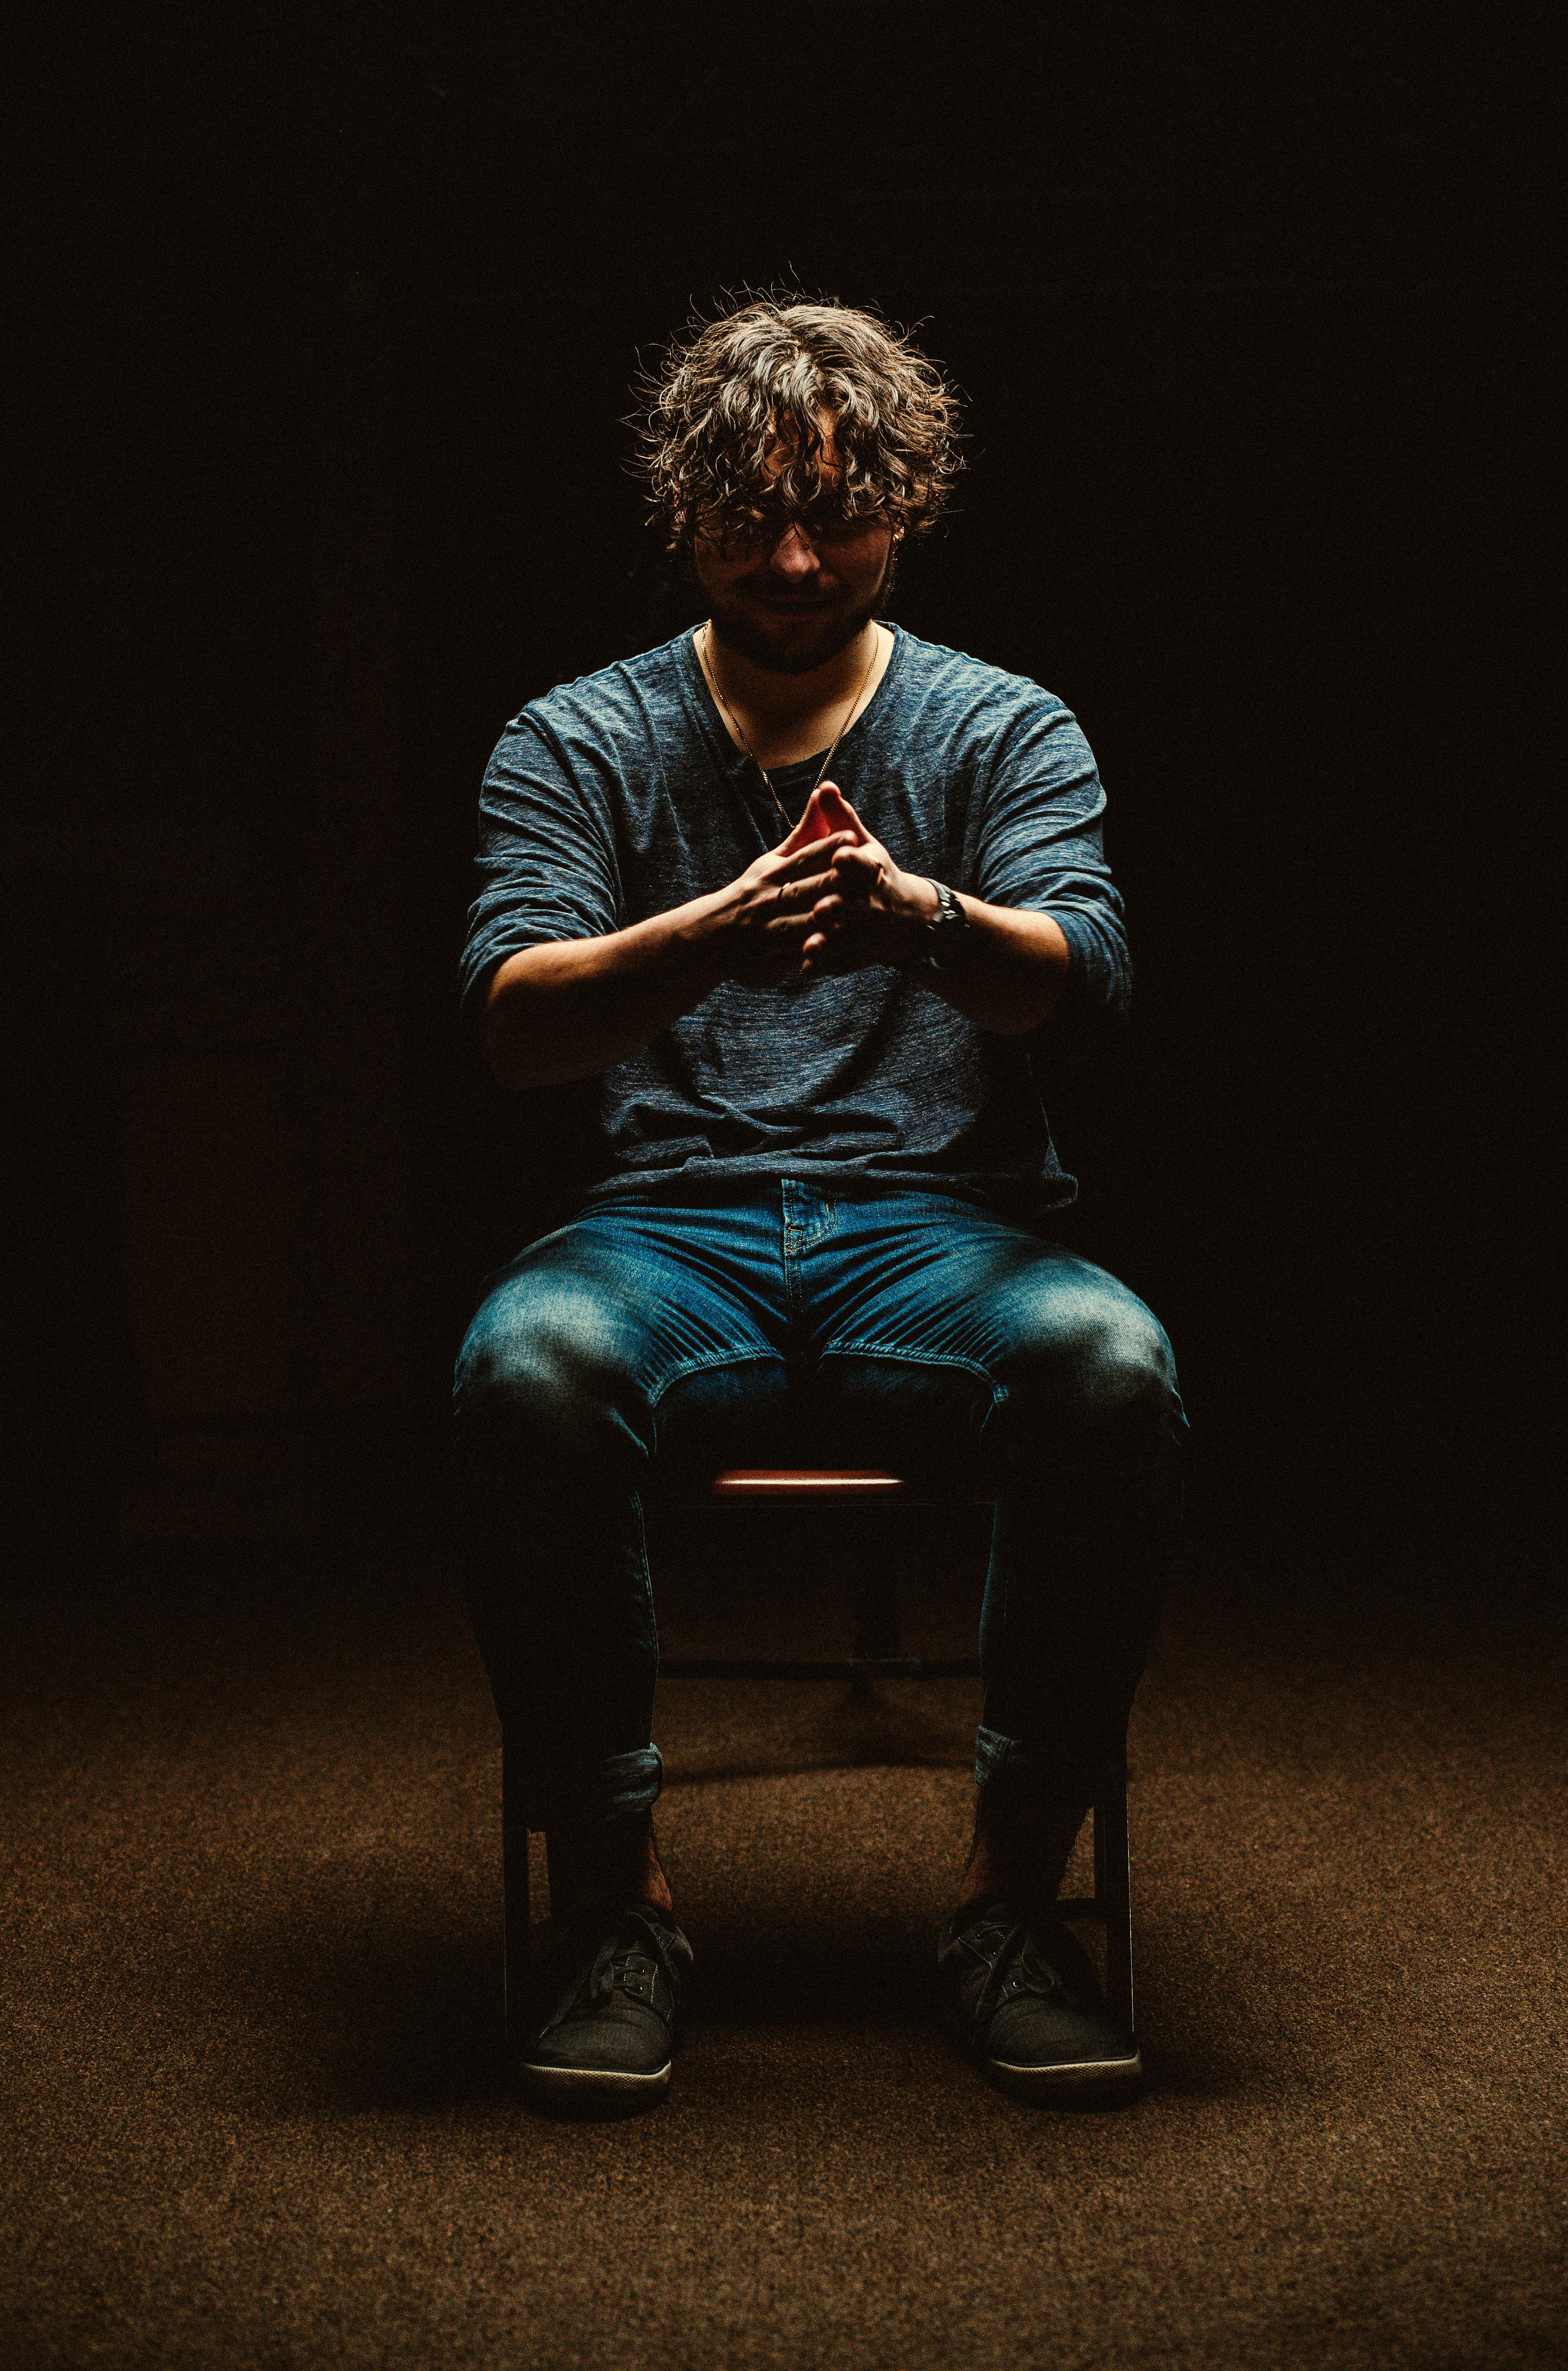 man sitting on chair inside dim room